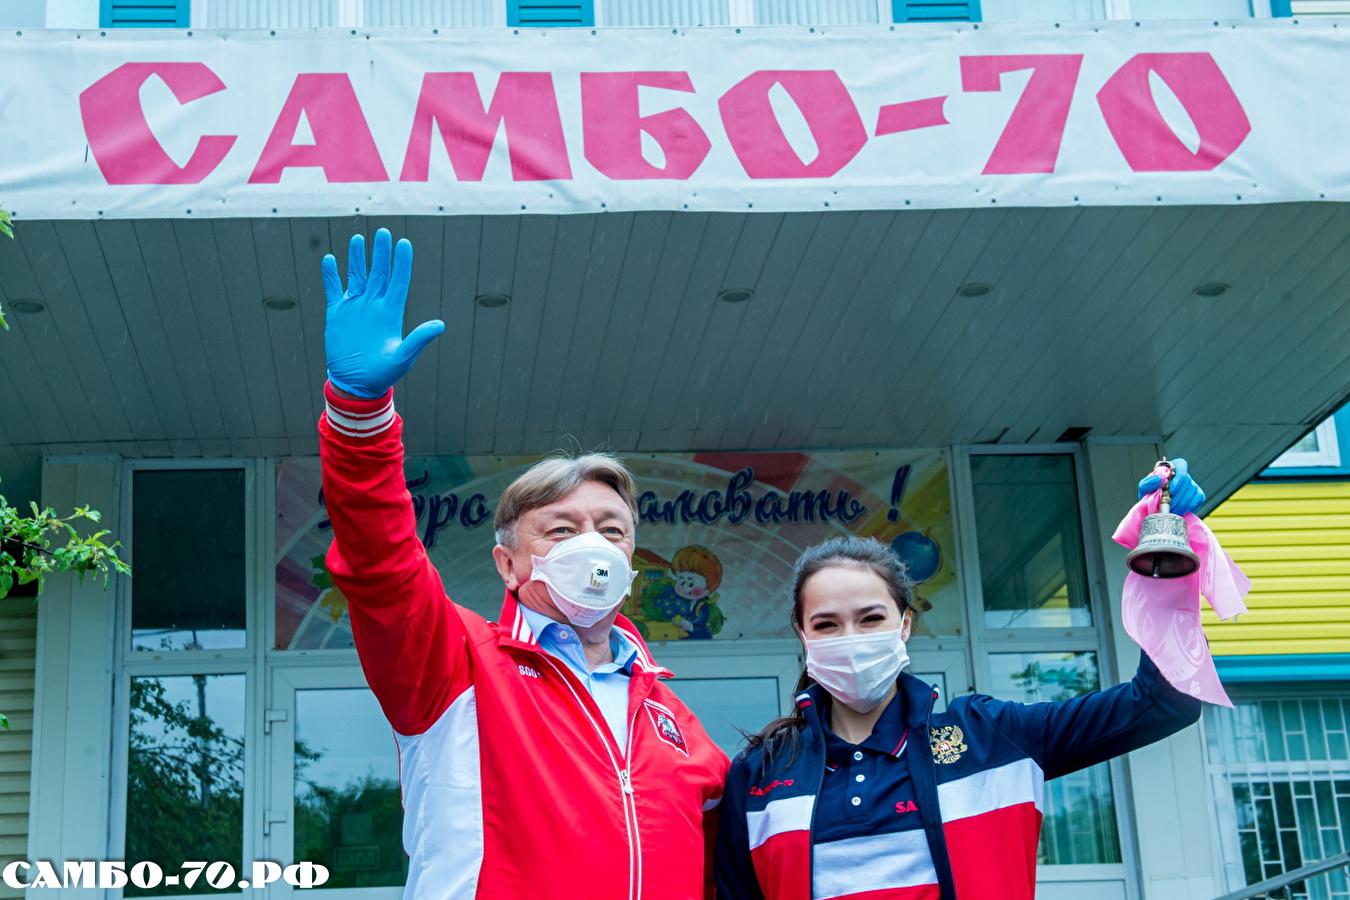 Алина Ильназовна Загитова-3 | Олимпийская чемпионка - Страница 9 7633efa9ae024cb96490bd9b2a067015